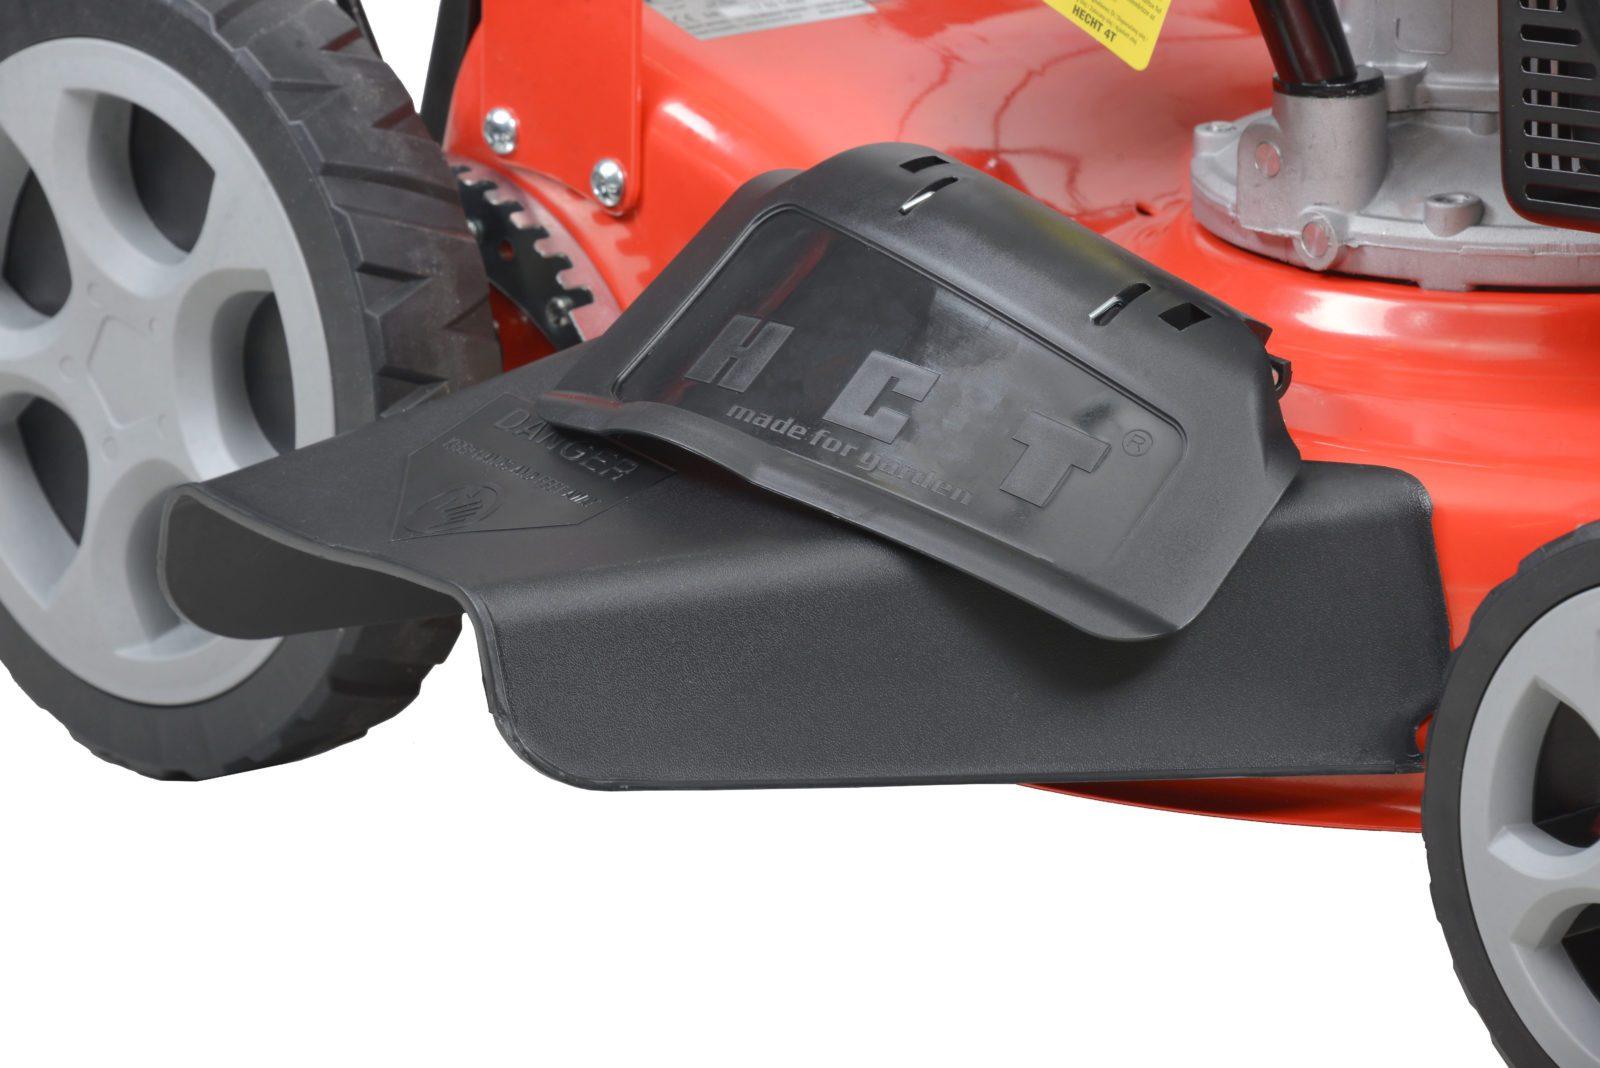 Corta-Relva Gasolina 5in1  Triturador HCT LM 547 SXW - 5.00HP